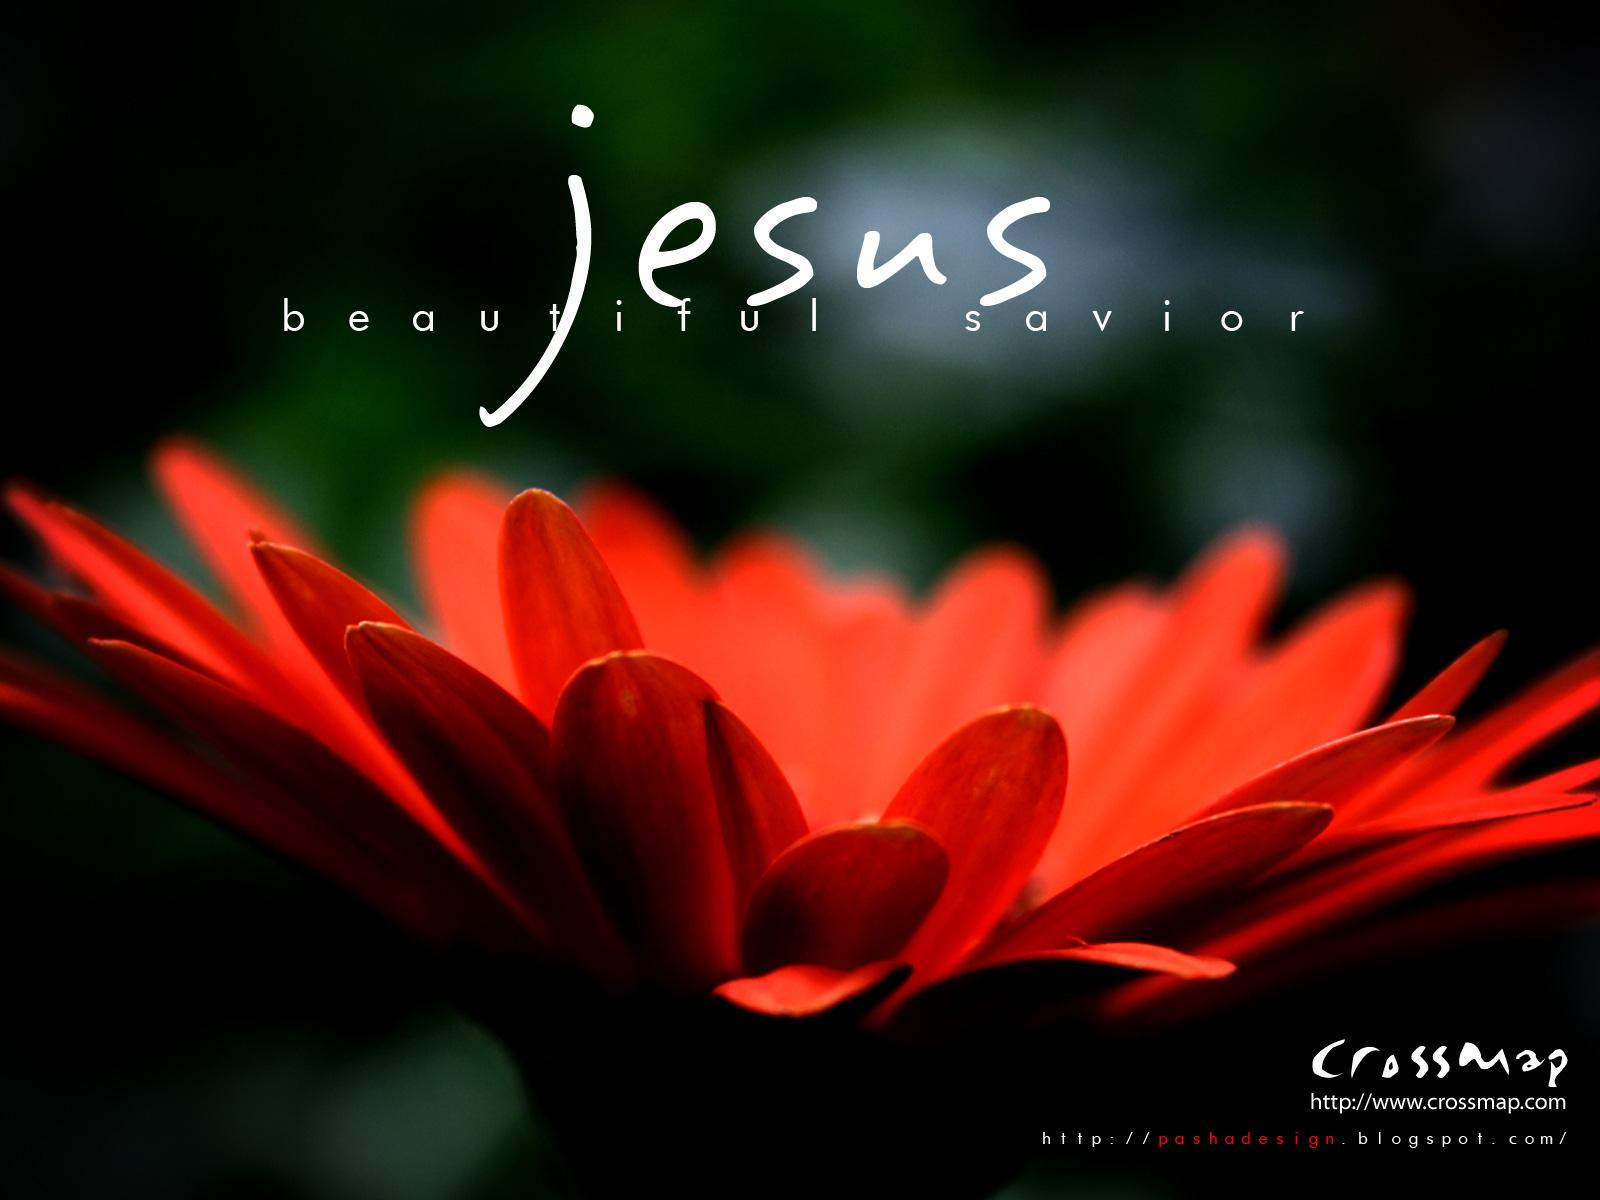 Jesus Beautiful Savior